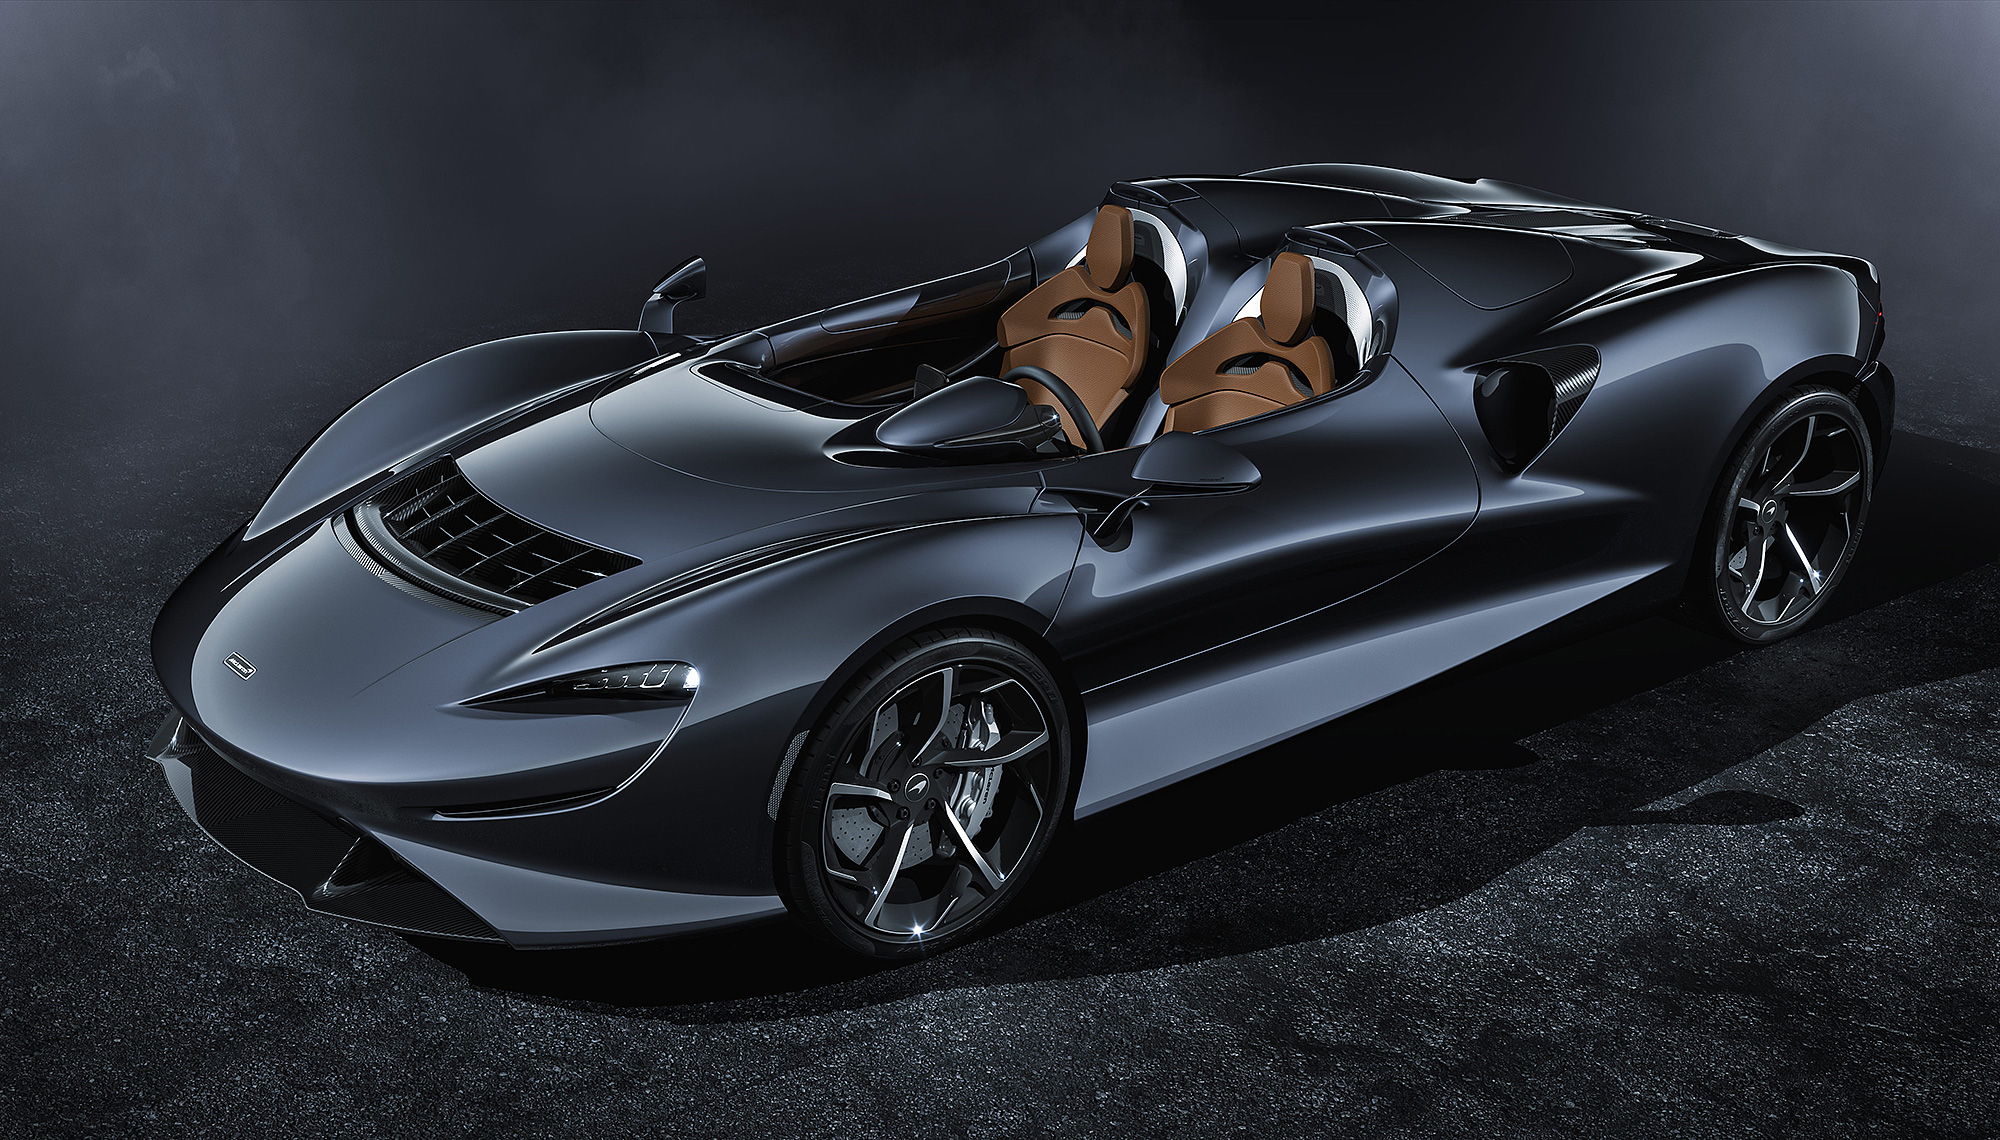 Elva 不但有向經典致敬的外觀設計,還有 McLaren 產品線最強悍的加速性能。